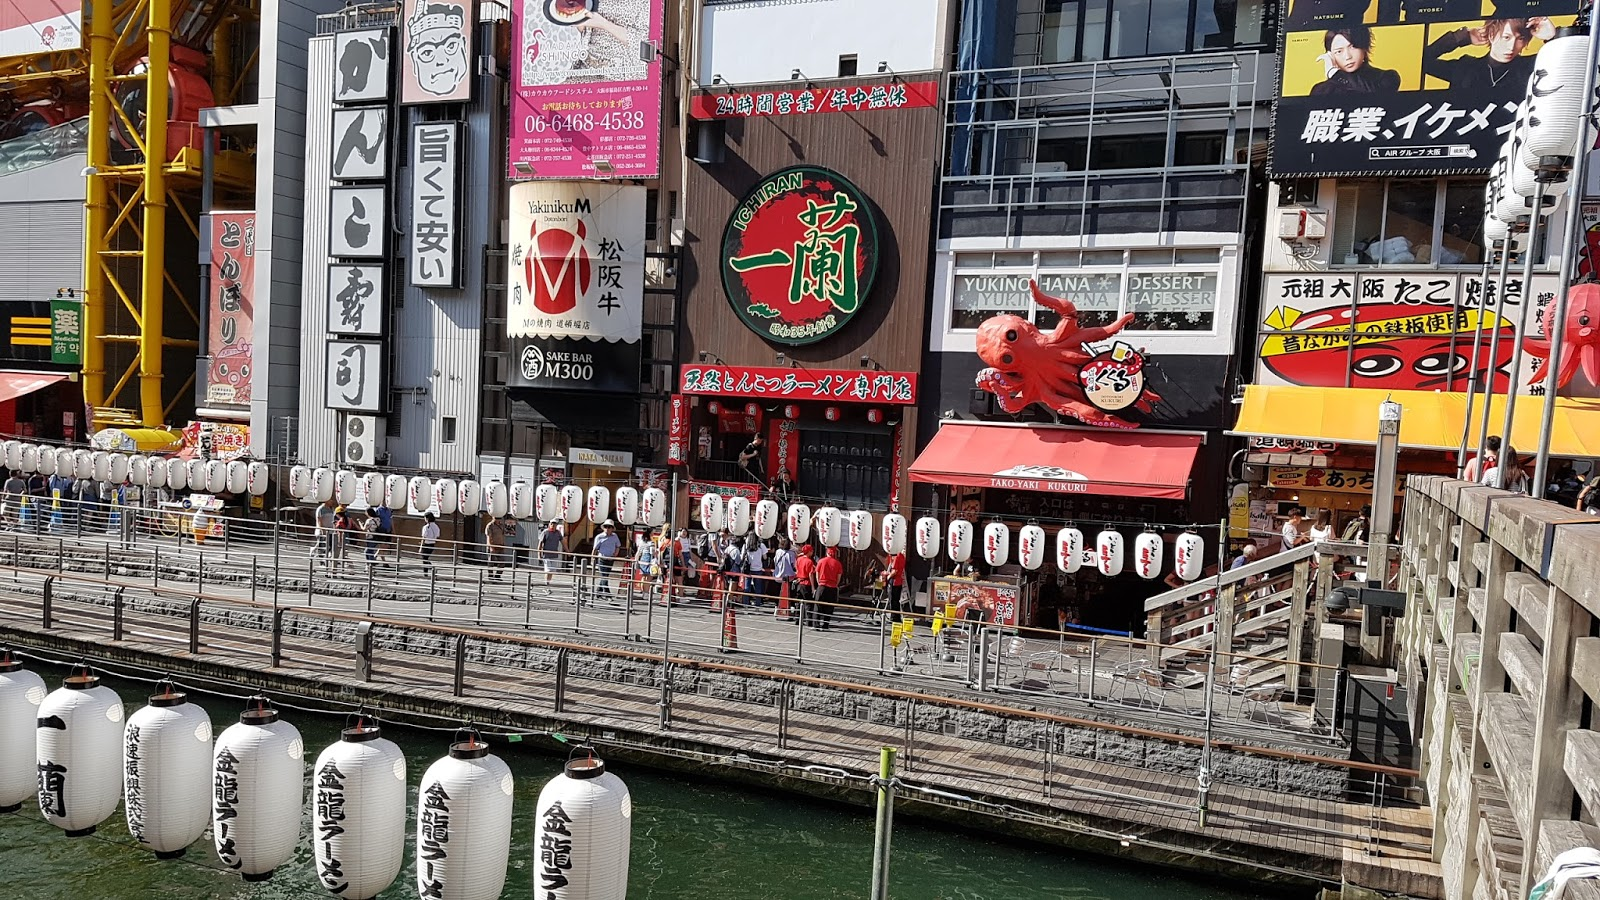 Japan Travel Blog Osaka Ichiran Ramen in Dotonbori